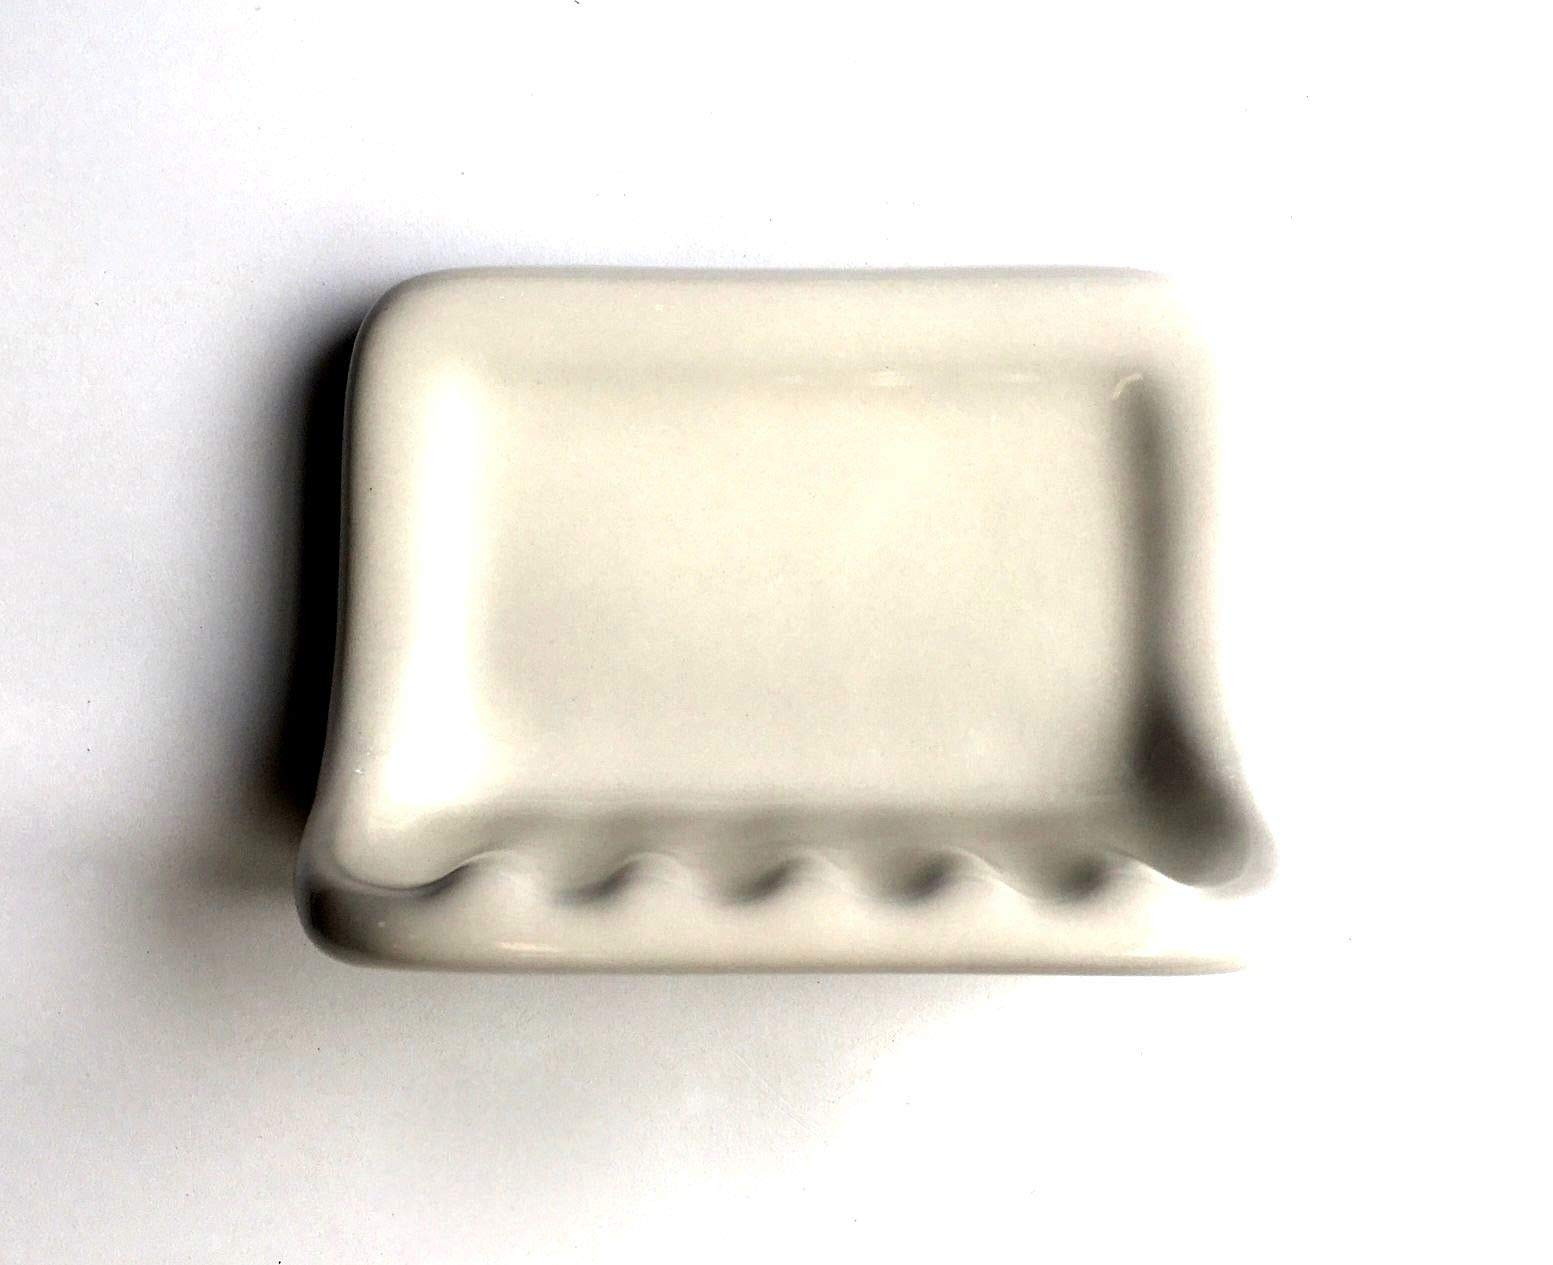 Squarefeet Depot Bath Accessory Shower Soap Dish Almond Ceramic Thinset Mount 6-1/2'' x 4-7/8''